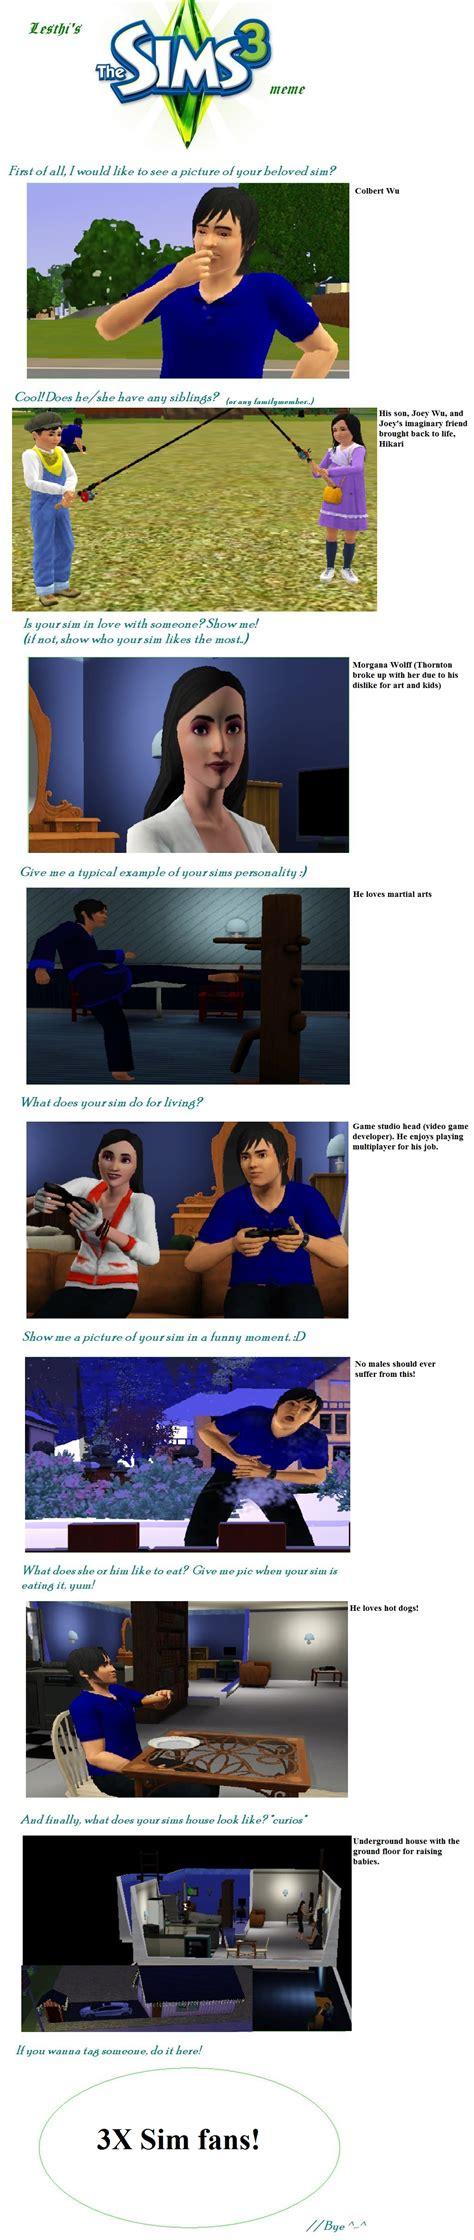 Sims 3 Meme - sims 3 meme by proudorcs on deviantart